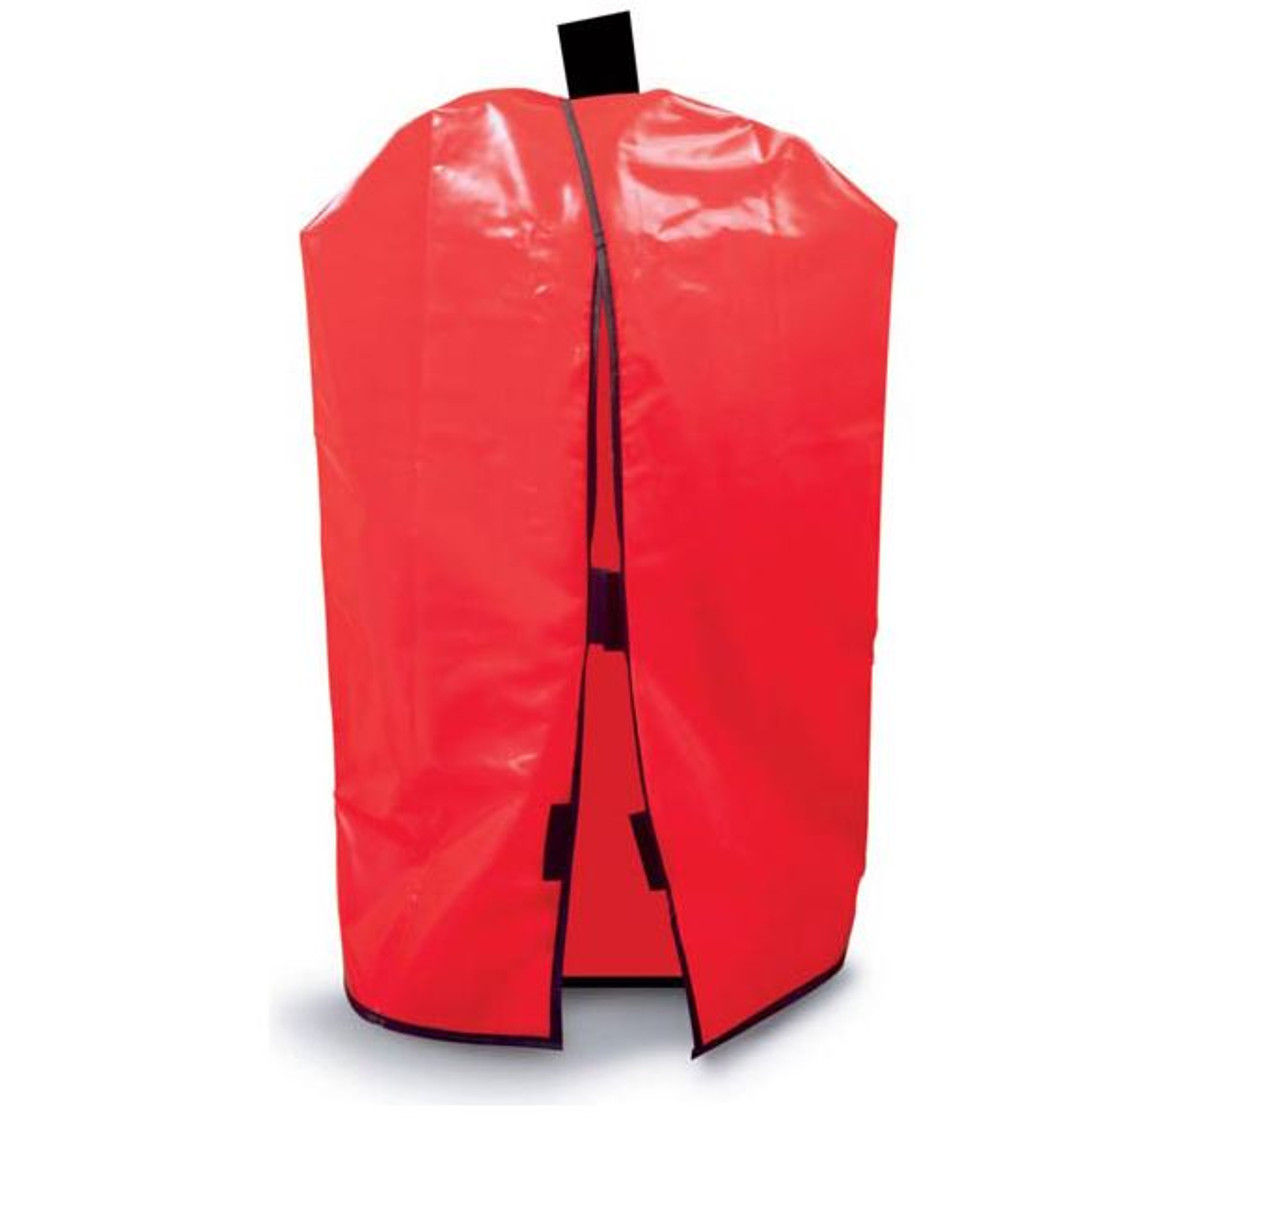 FEC2 - Medium Fire Extinguisher Cover w/ Hook-and-Loop